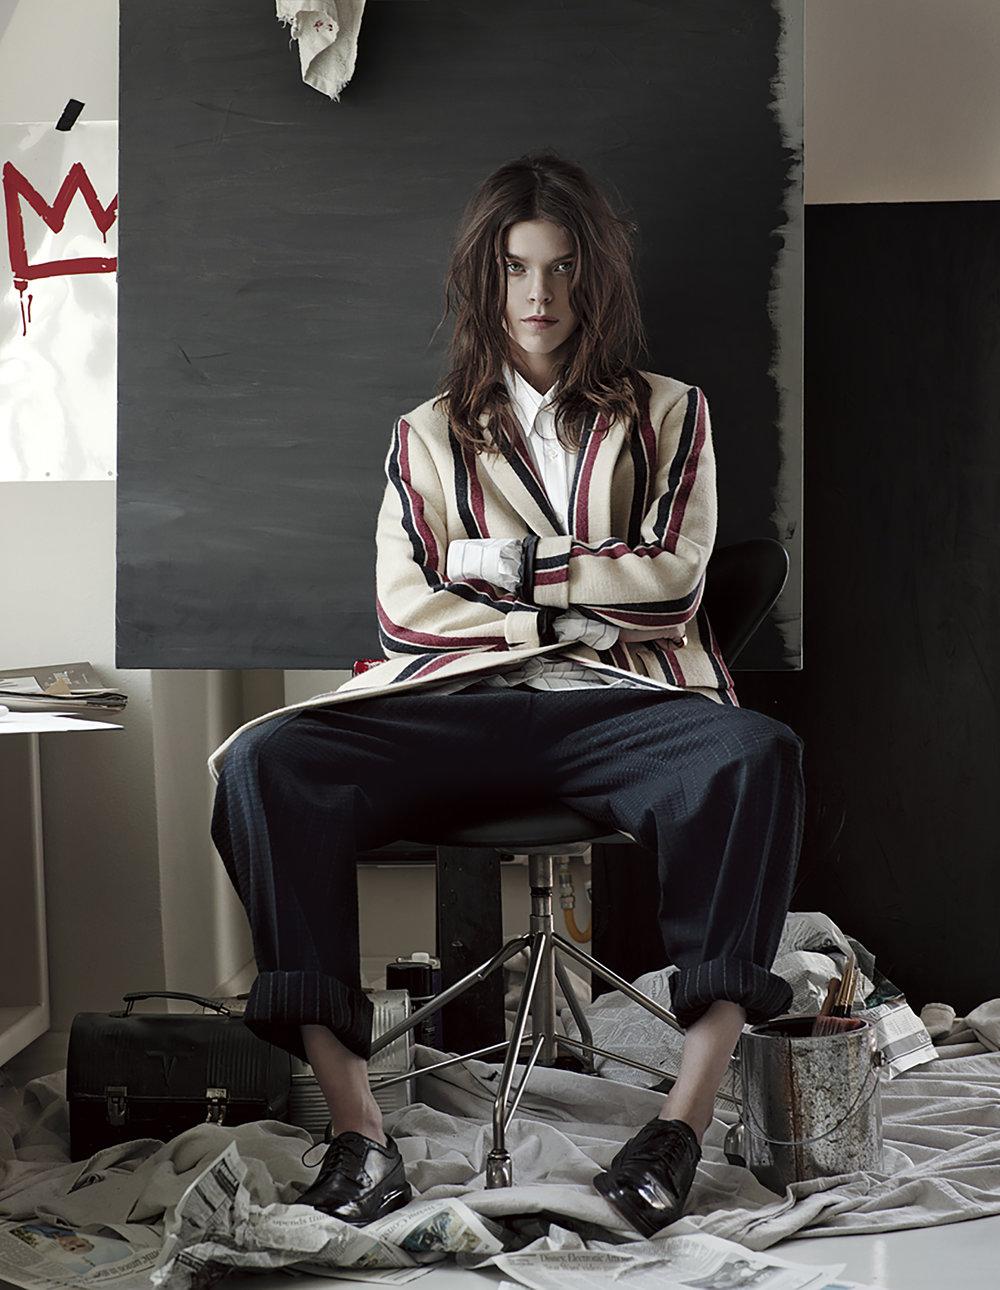 1401-VogueJapan-PortraitOfAnArtist-MSL_LMN-06.jpg